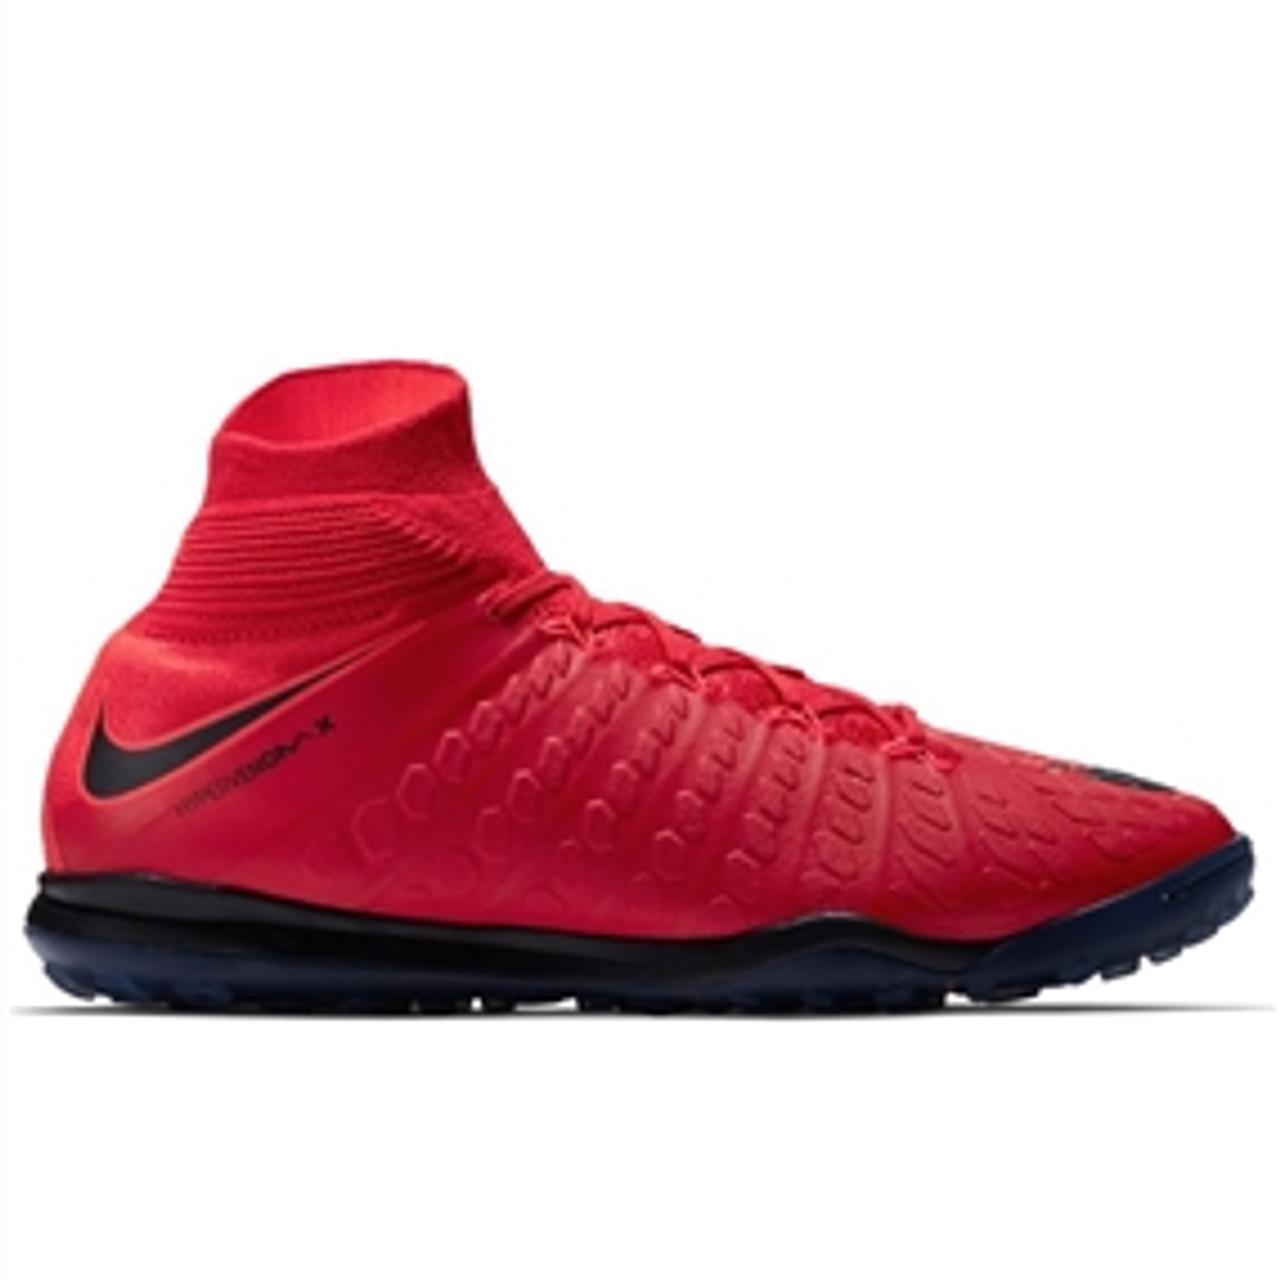 Nike HypervenomX Proximo II DF TF NIKE HYPERVENOMX PROXIMO II DF TF Turf University Red/Black ...